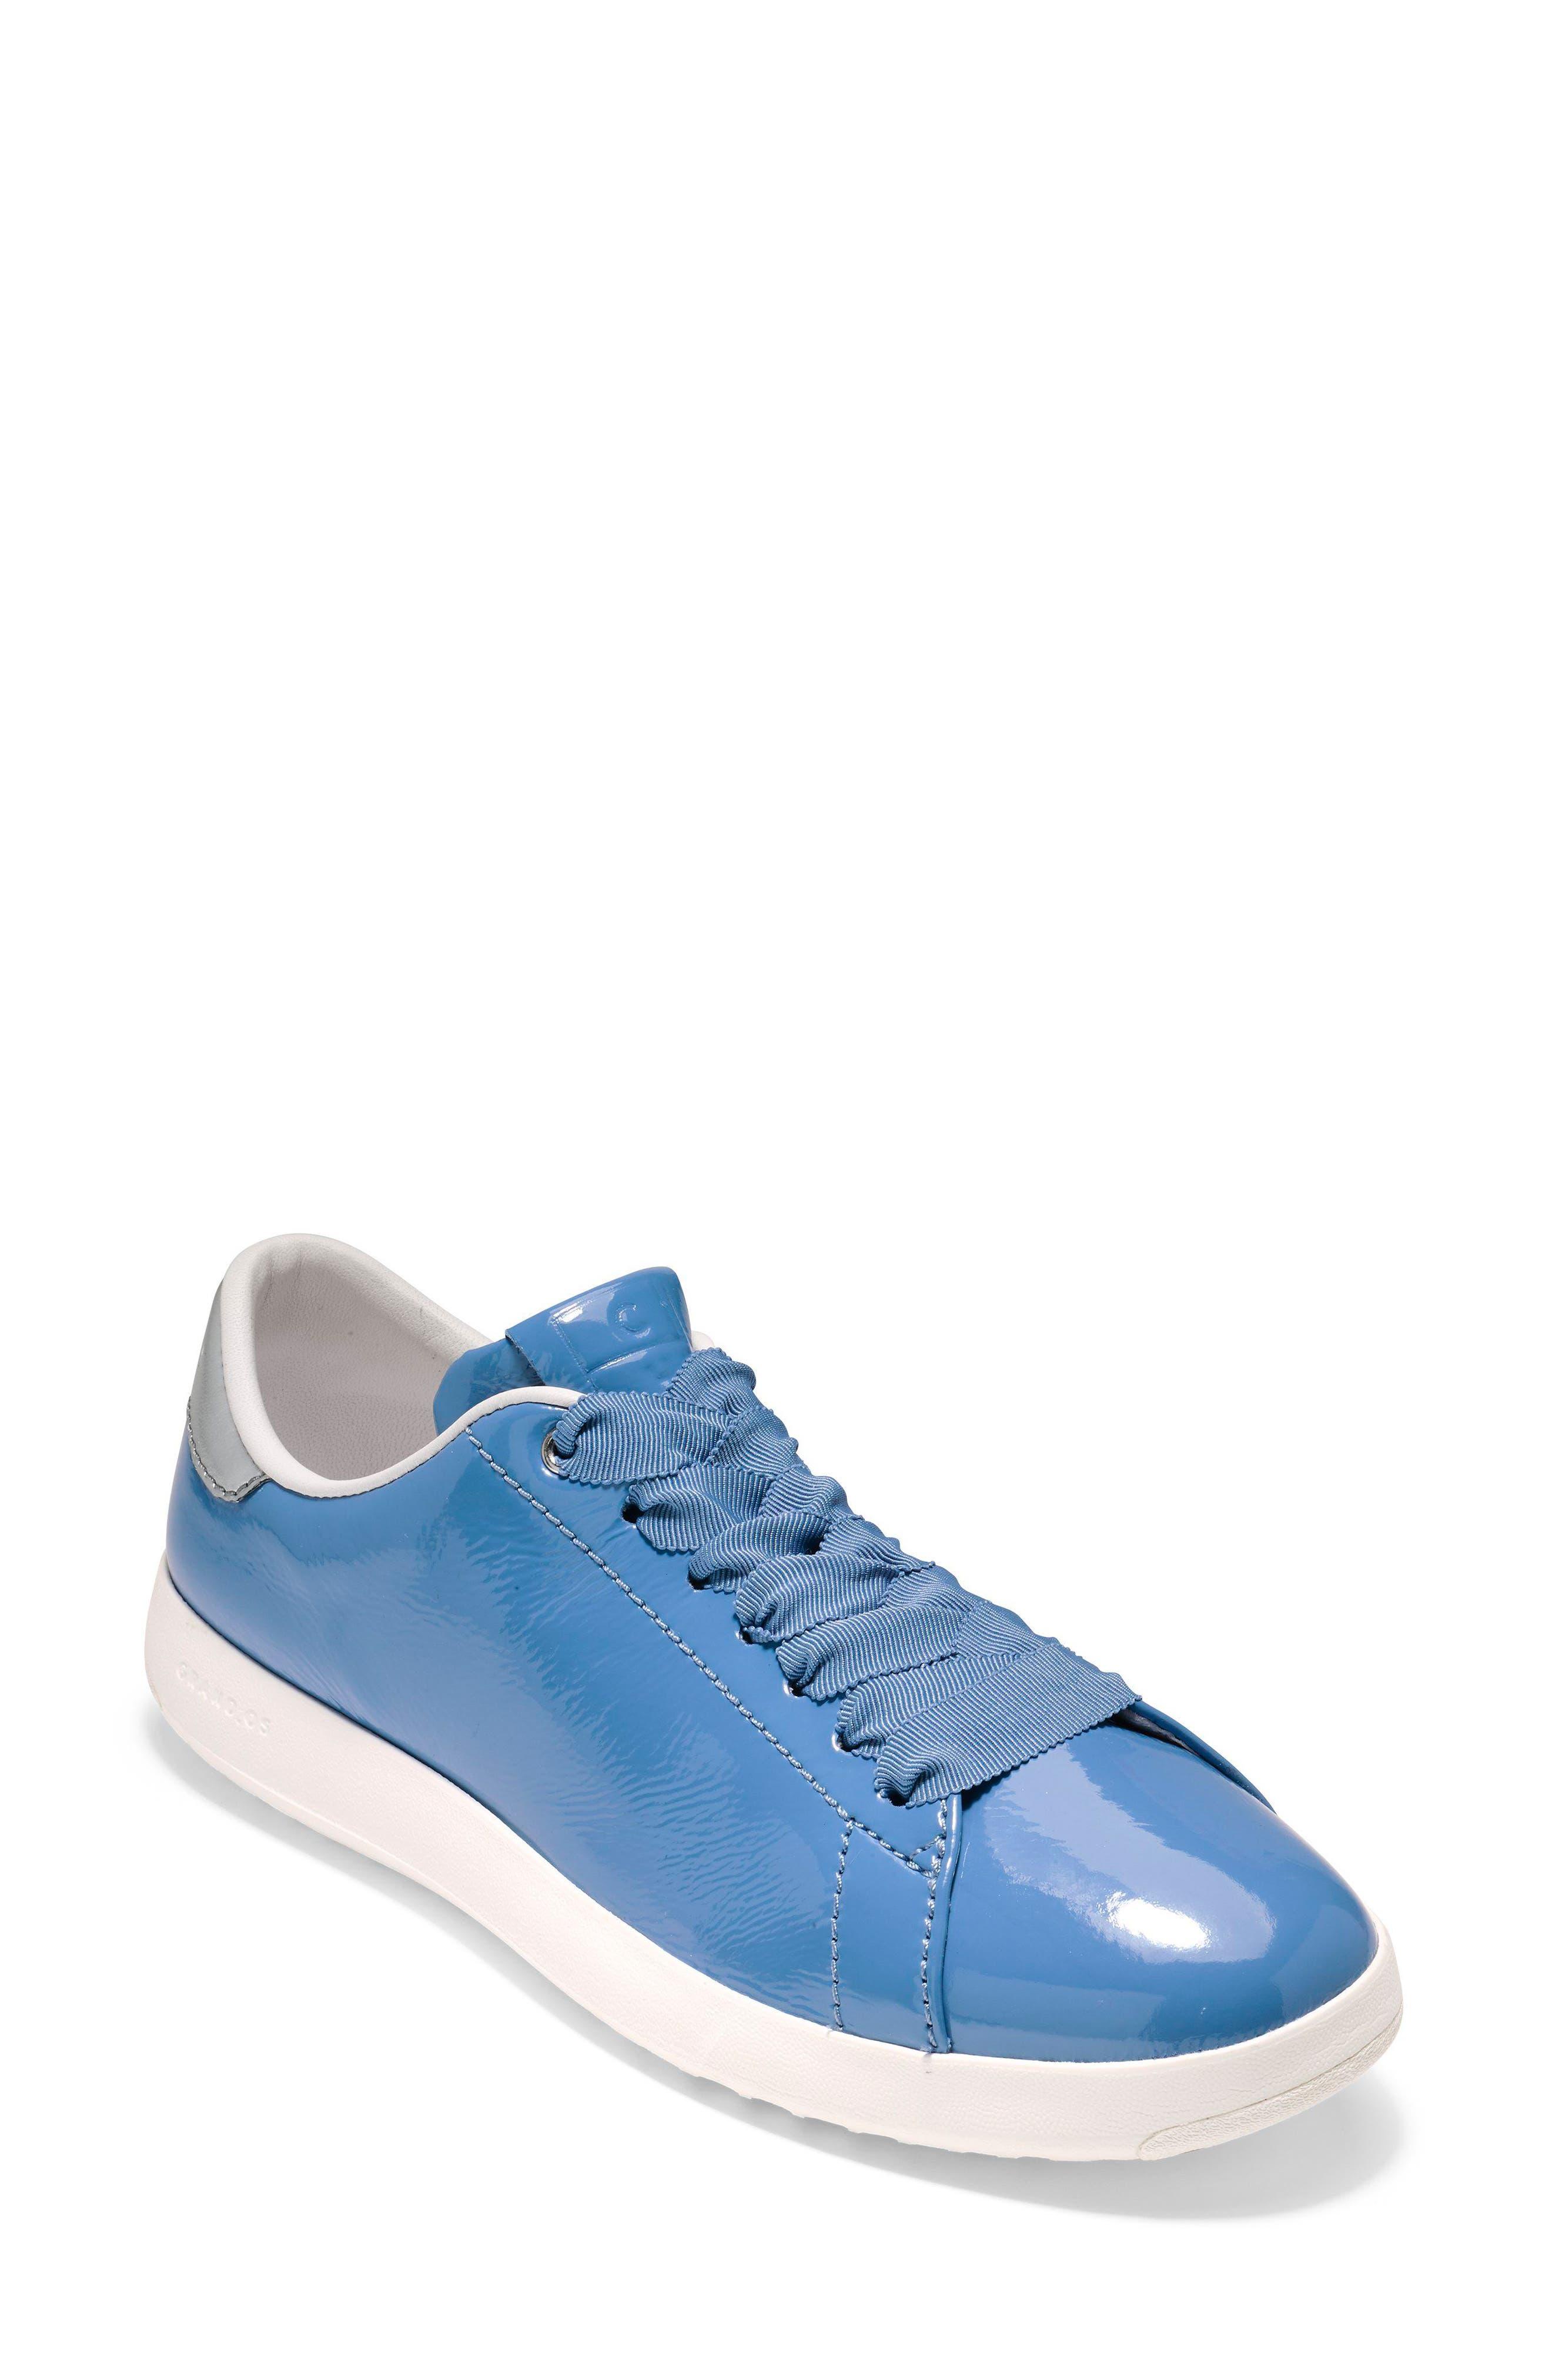 Main Image - Cole Haan Grandpro Tennis Shoe (Women)